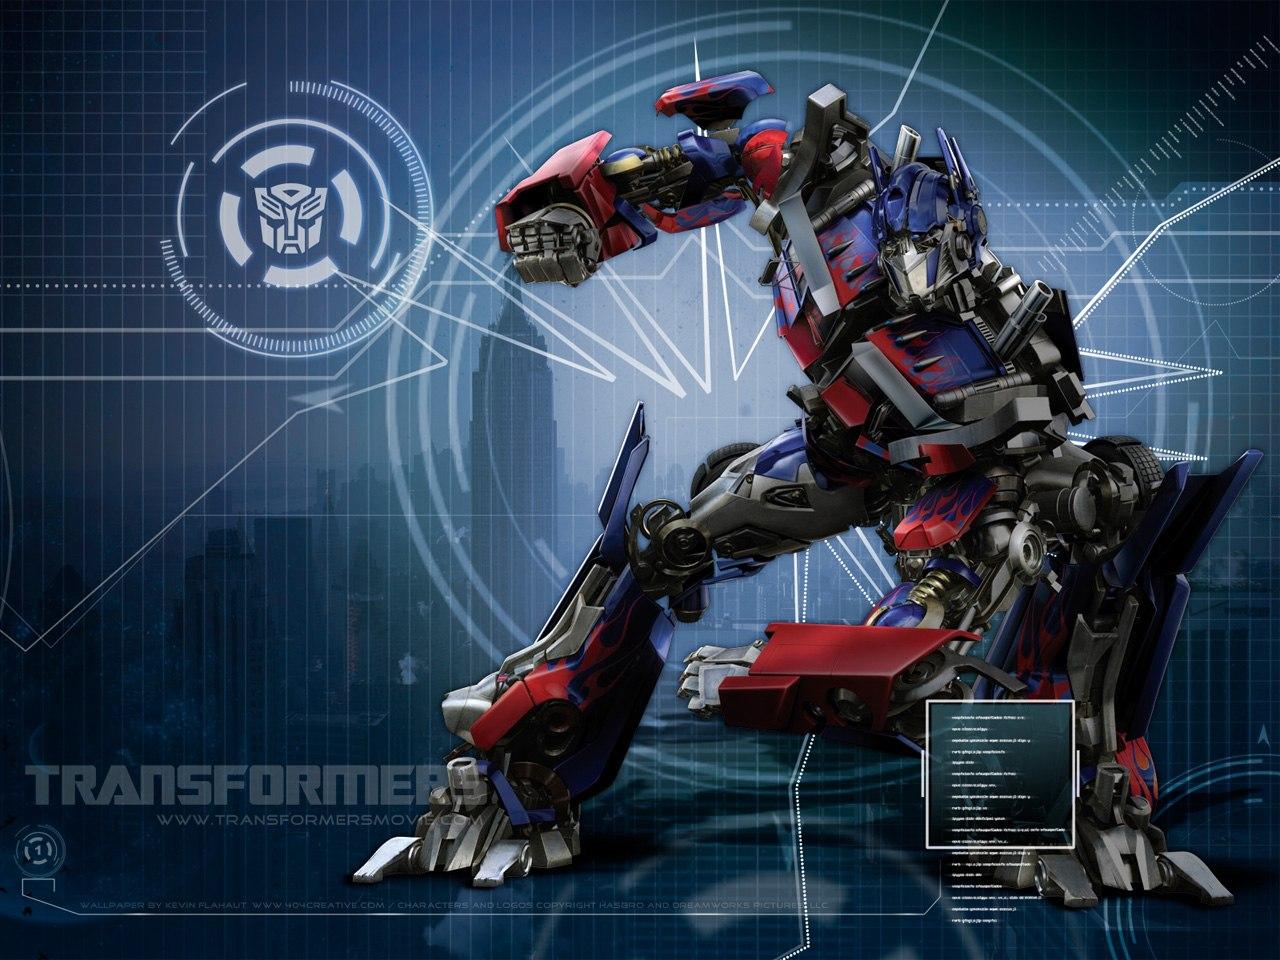 optimus prime transformers - photo #29